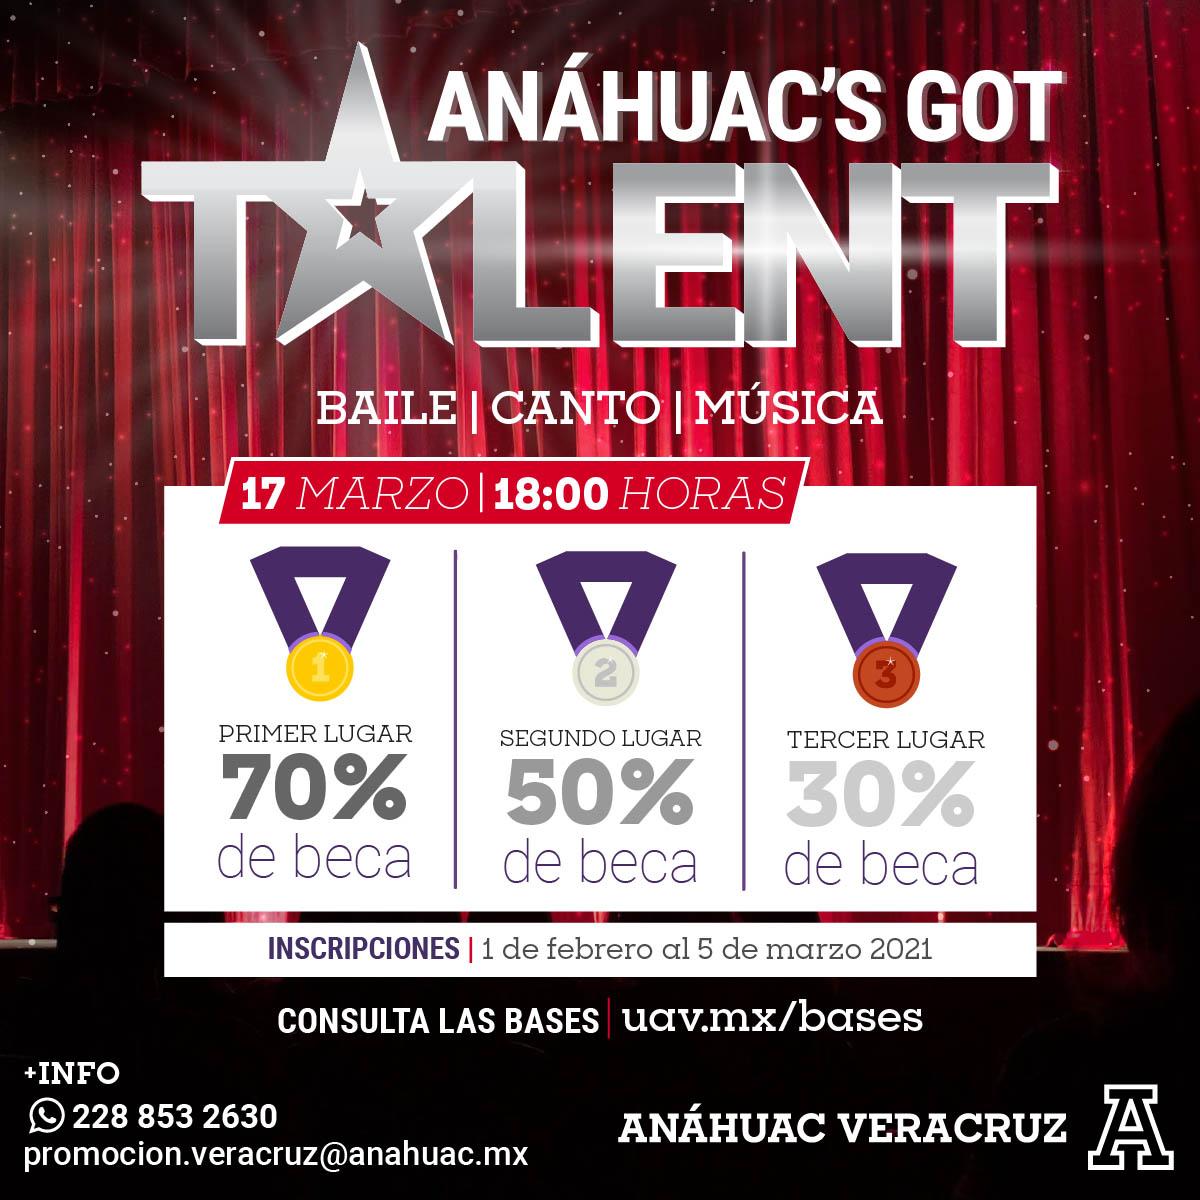 Anáhuac's Got Talent